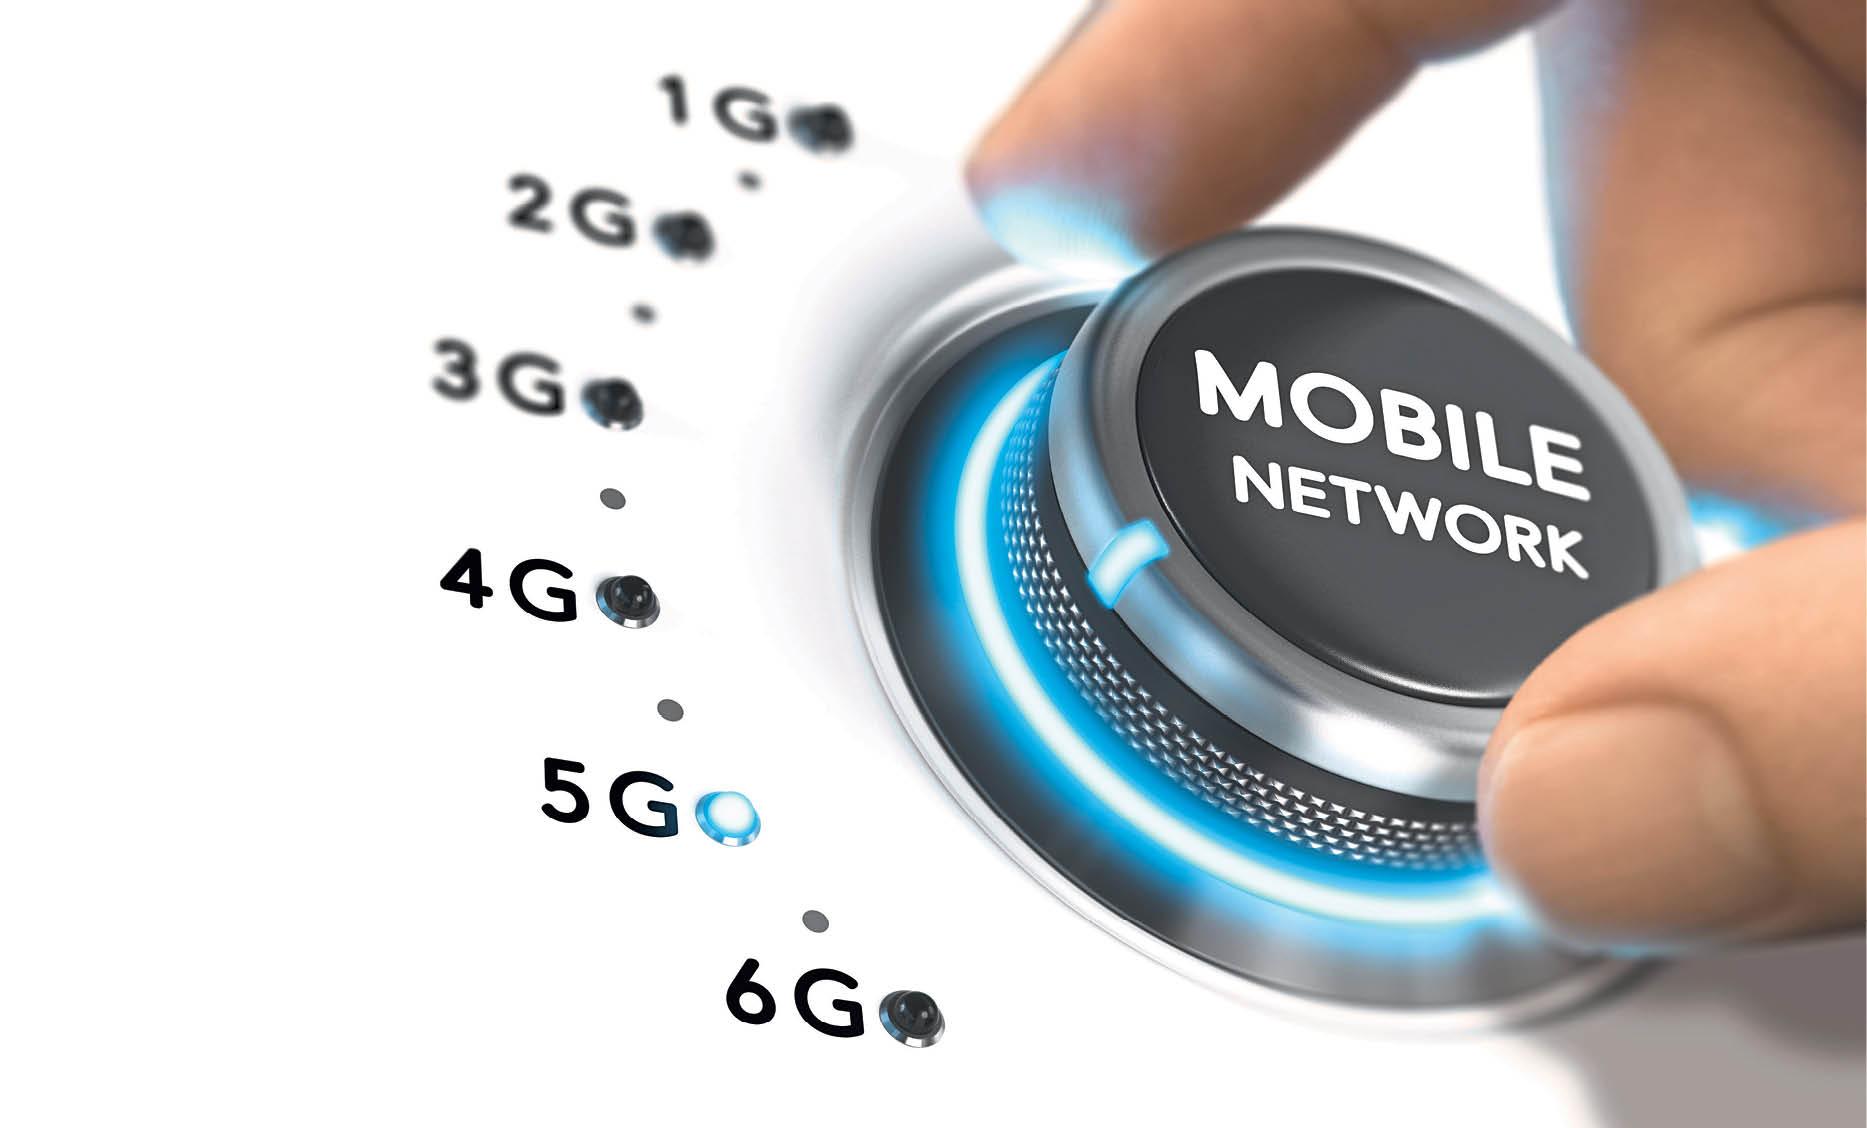 мобильные сети / mobile network / 3G / 4G / 5G / 6G